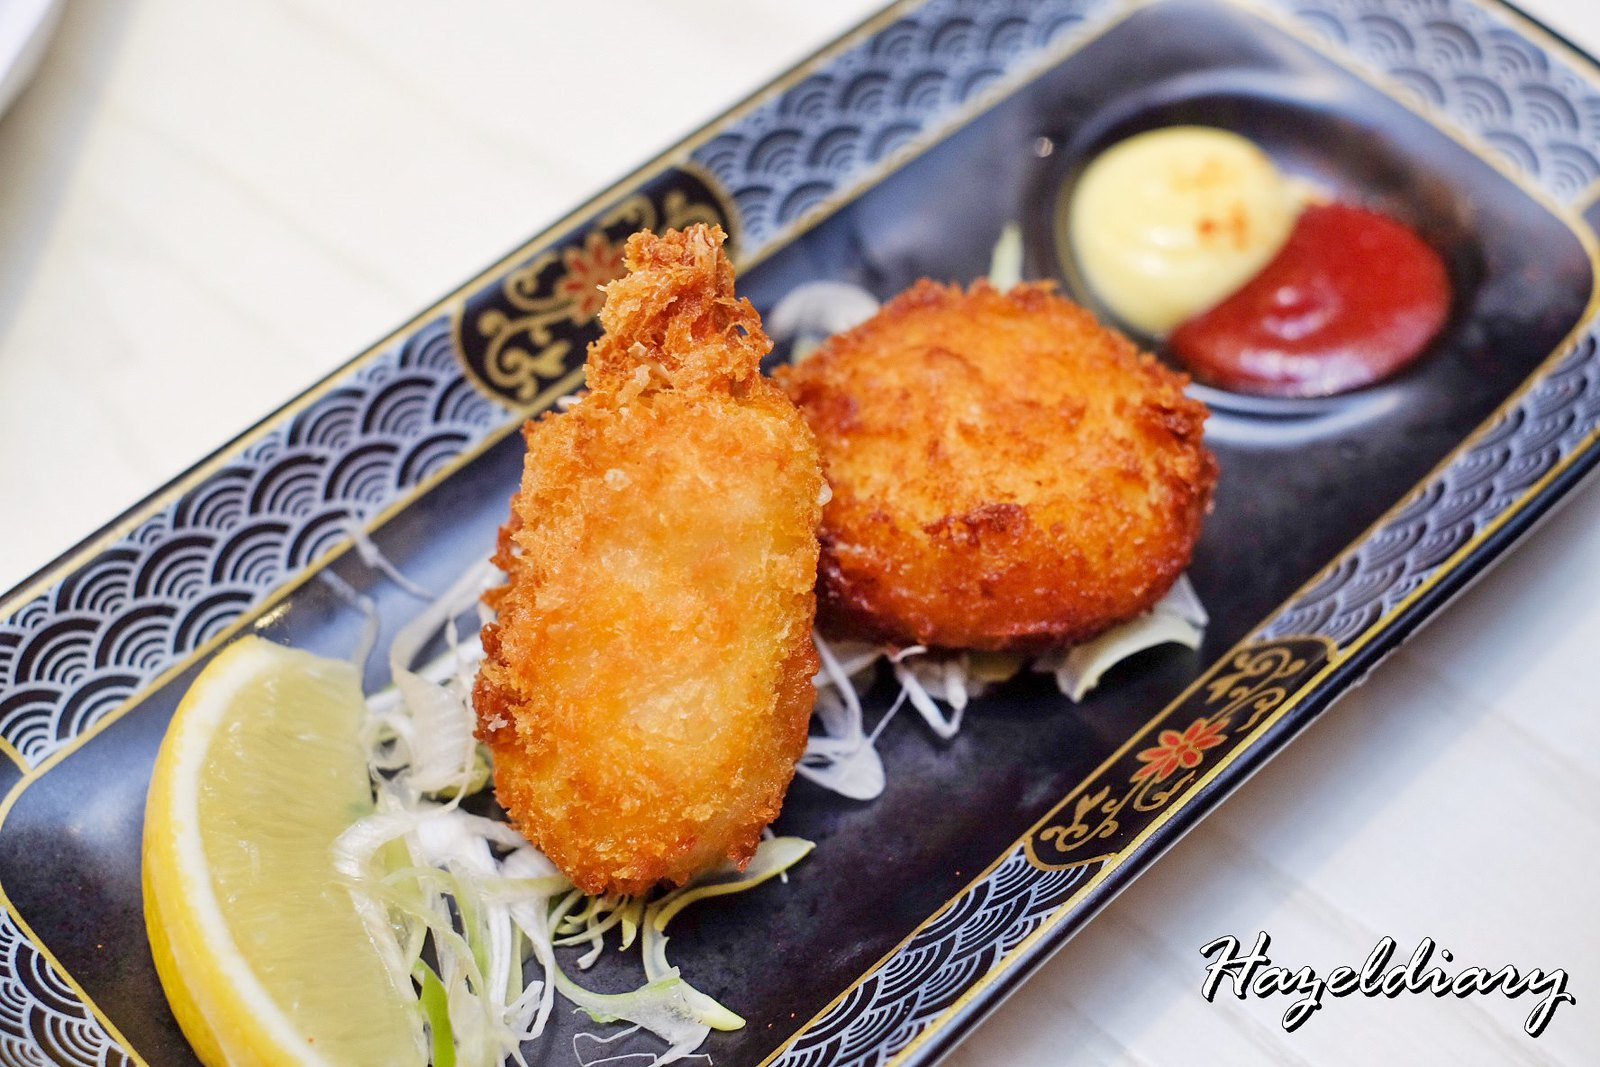 Sapporo Misono- Hokkaido Style Ramen Concept By Keisuke Takeda-Kani Tsume Cream Fry